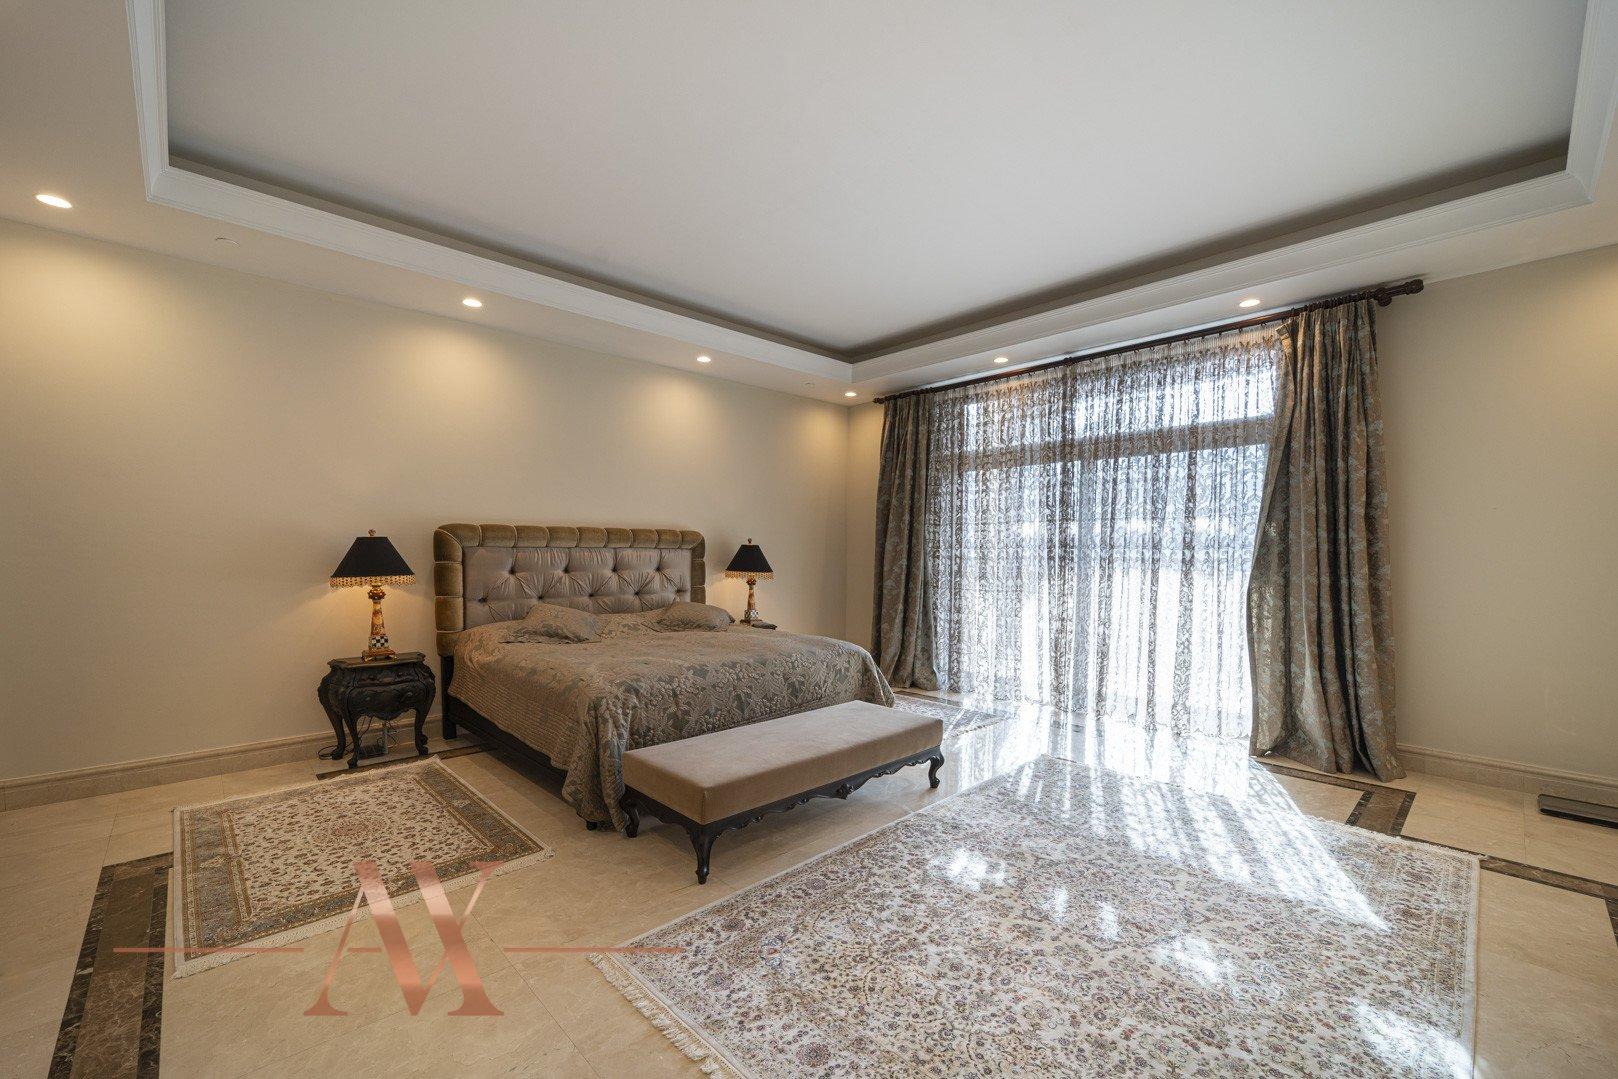 Penthouse for sale in Dubai, UAE, 5 bedrooms, 1057 m2, No. 23747 – photo 12